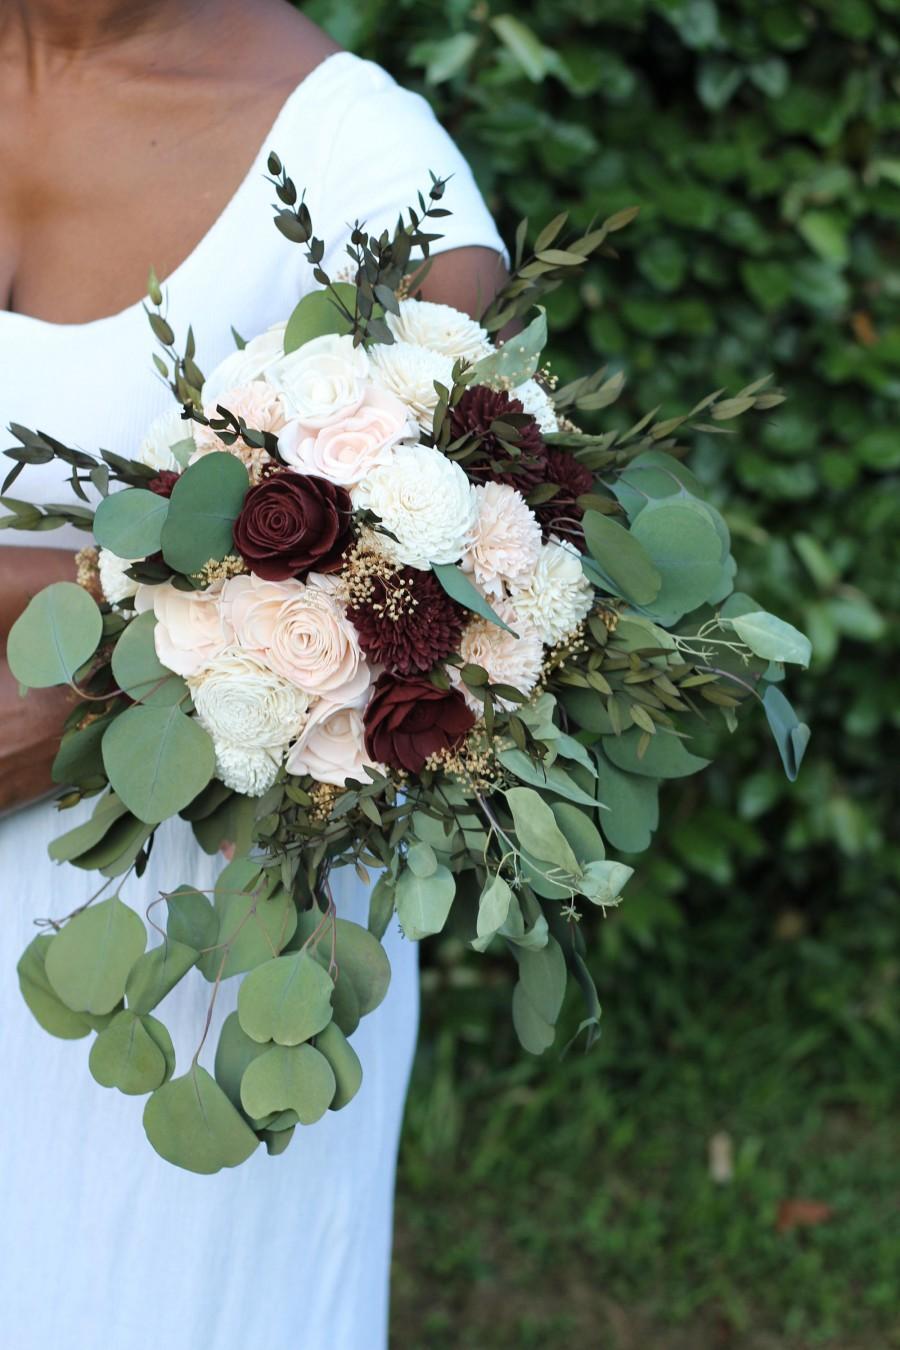 Wedding - Sola flower bouquet,blush and marsala,wine sola wood flowers,wedding bouquet eco flowers,alternative keepsake bouquet,burgundy sola flowers